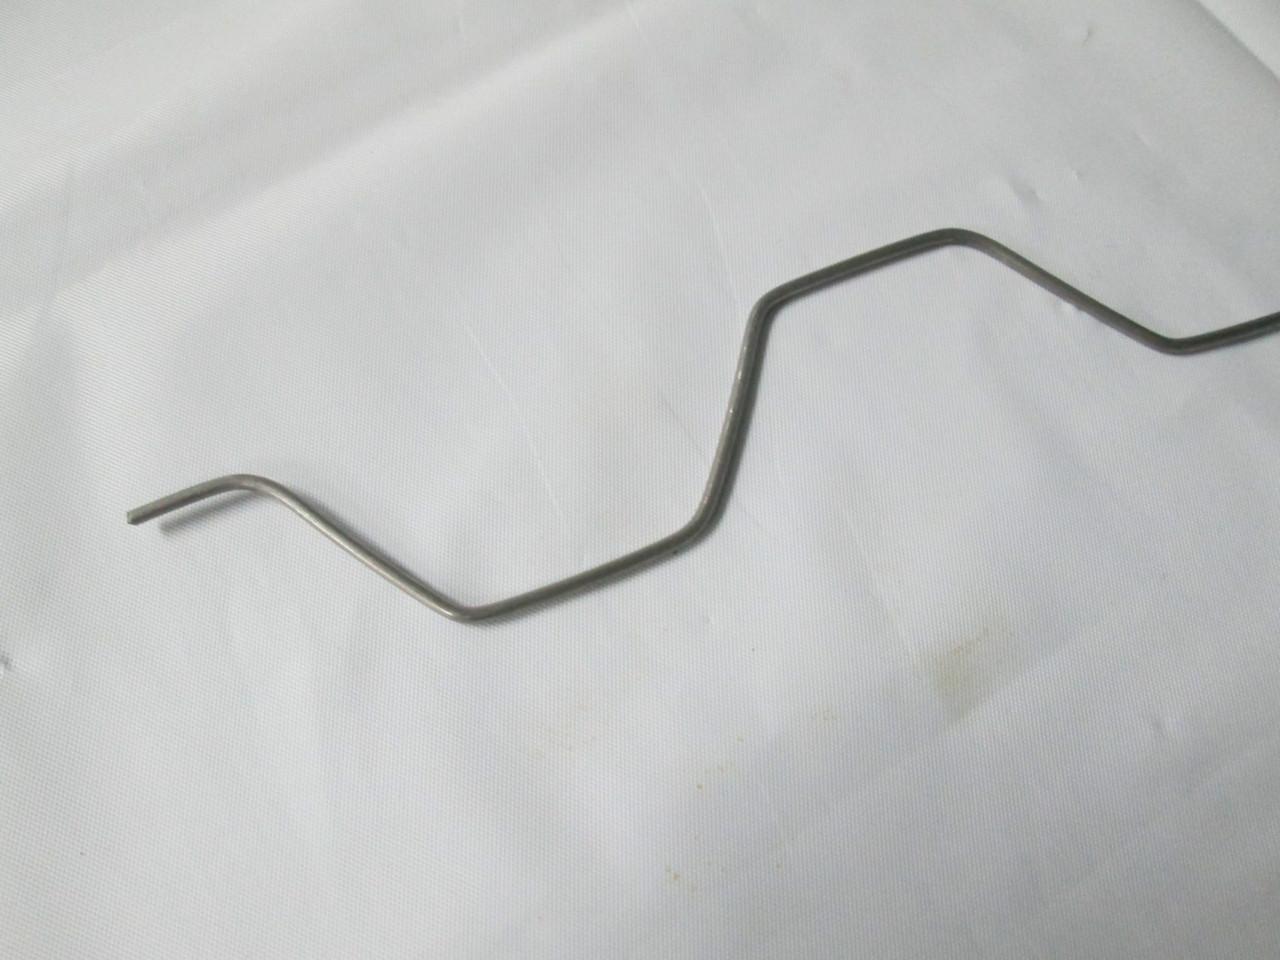 Пружина Экстра (пружина зиг-заг)  для комплектации профиля Зиг-заг